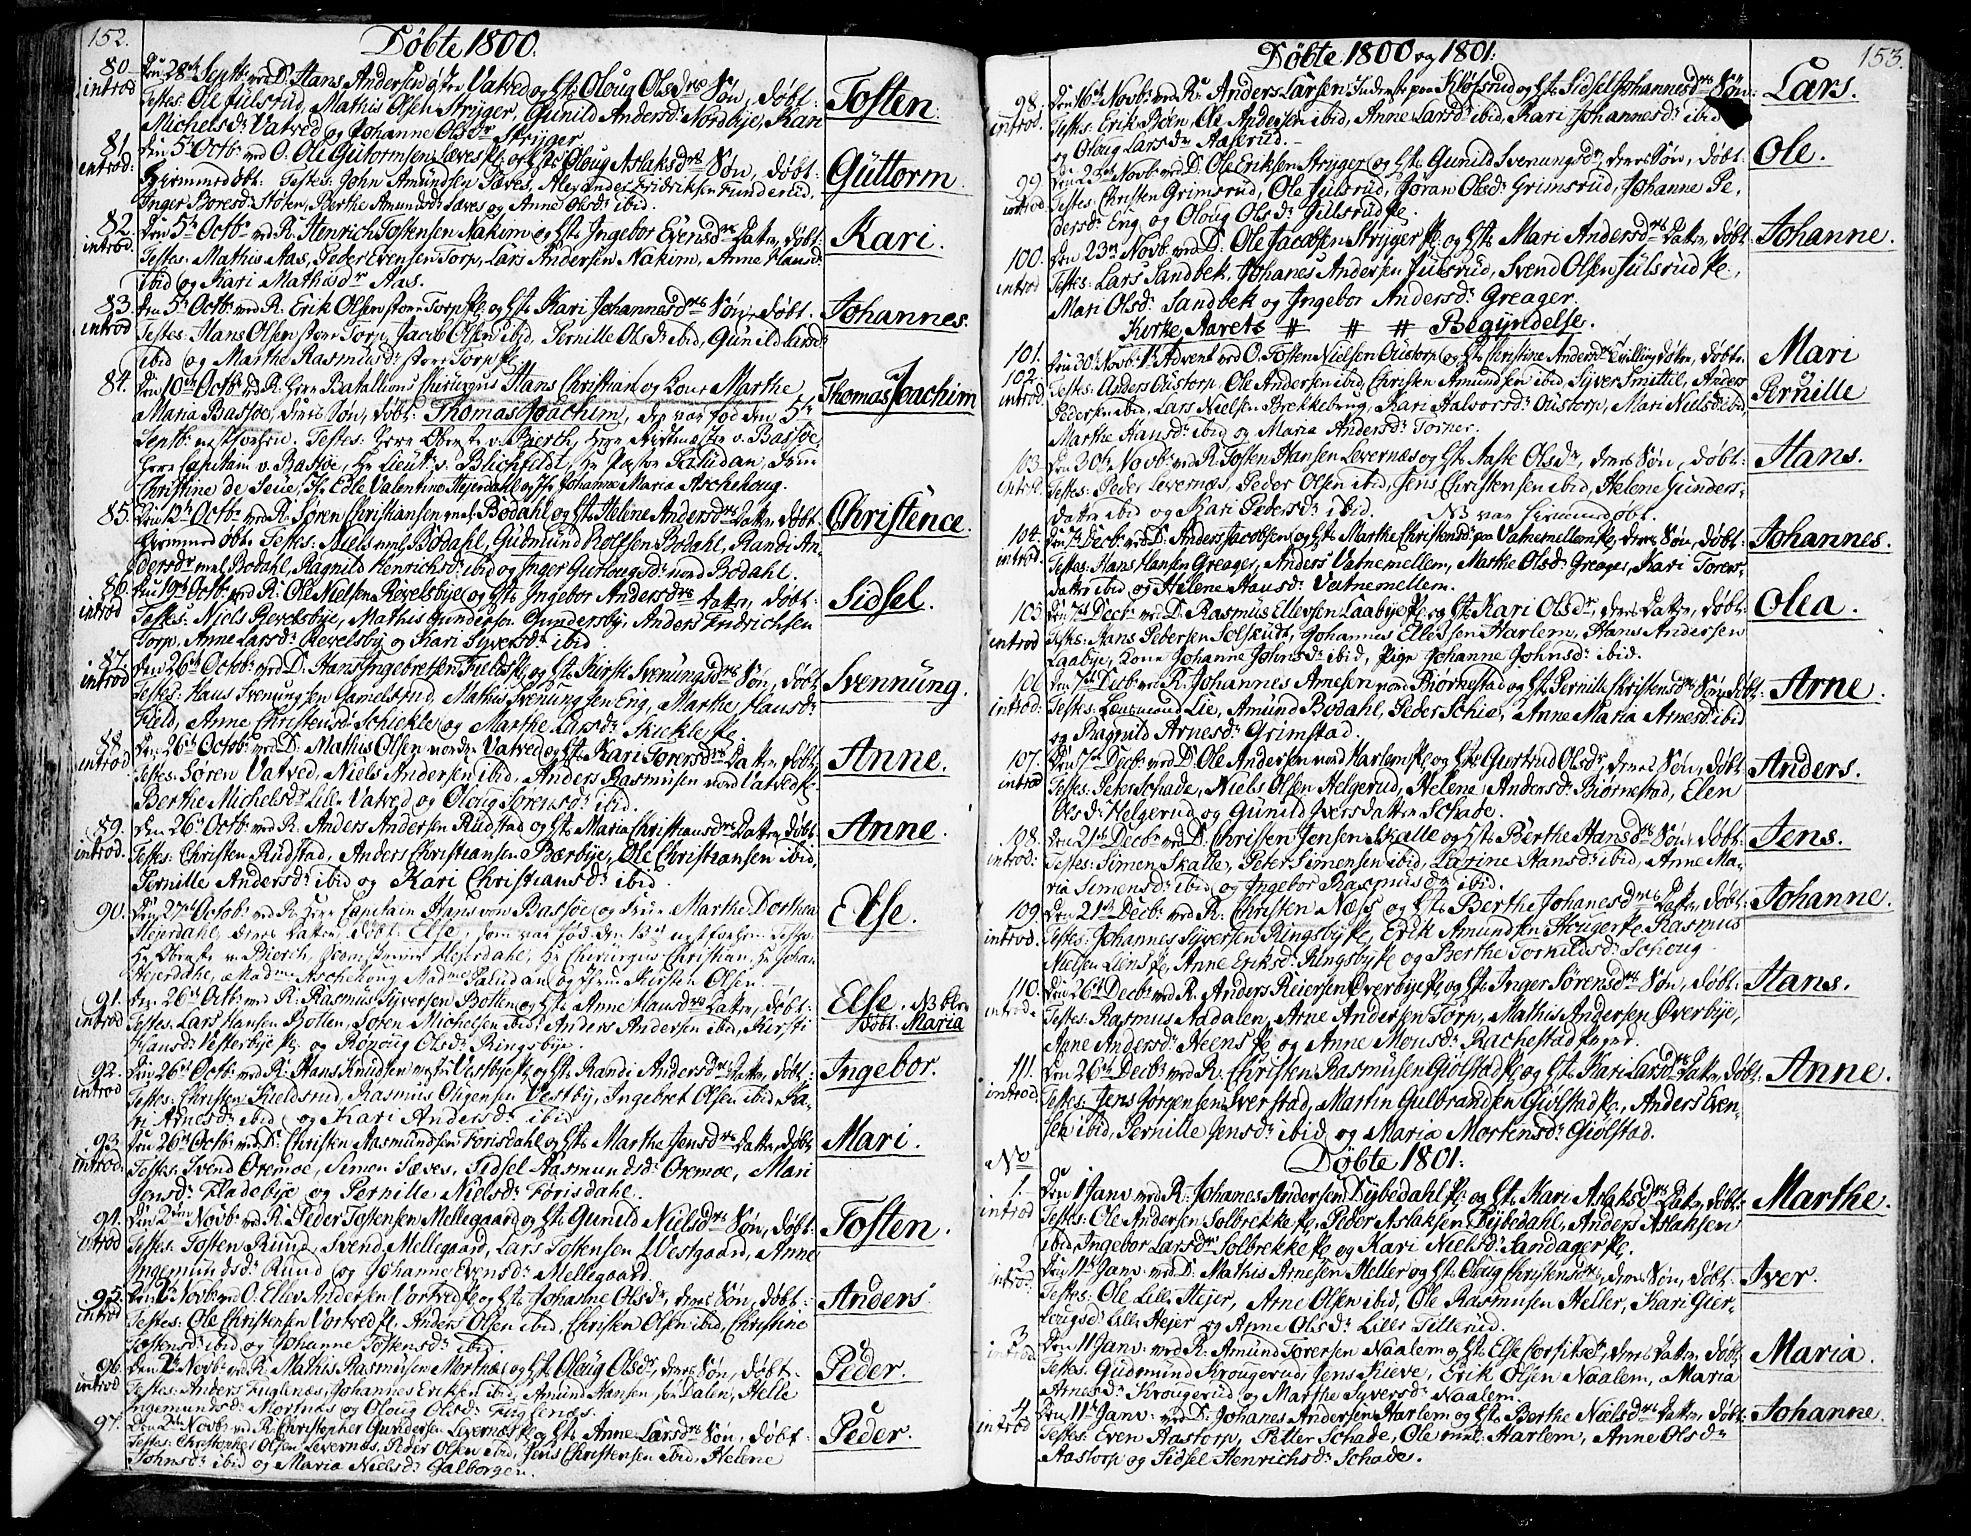 SAO, Rakkestad prestekontor Kirkebøker, F/Fa/L0005: Parish register (official) no. I 5, 1784-1814, p. 152-153